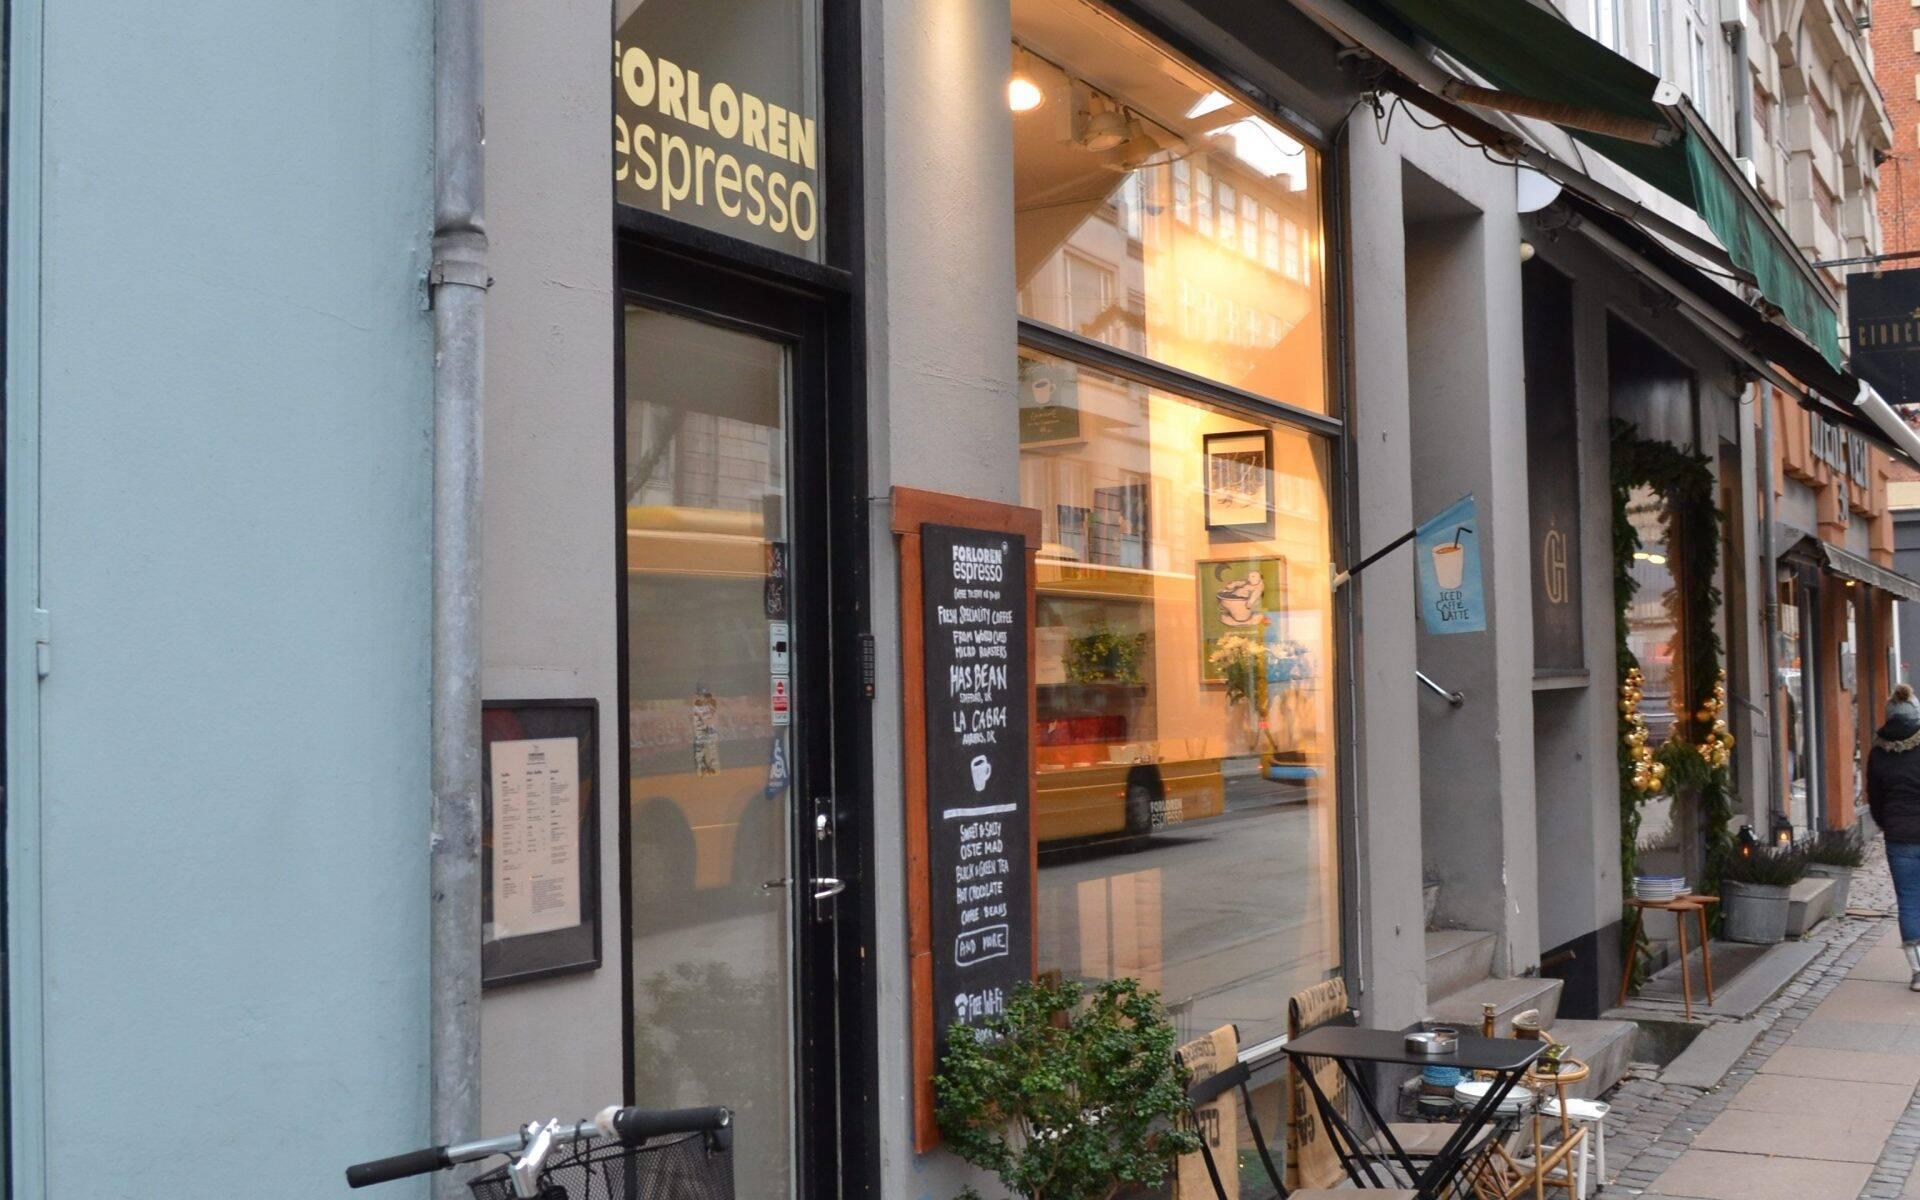 Forloren Espresso Kopenhagen